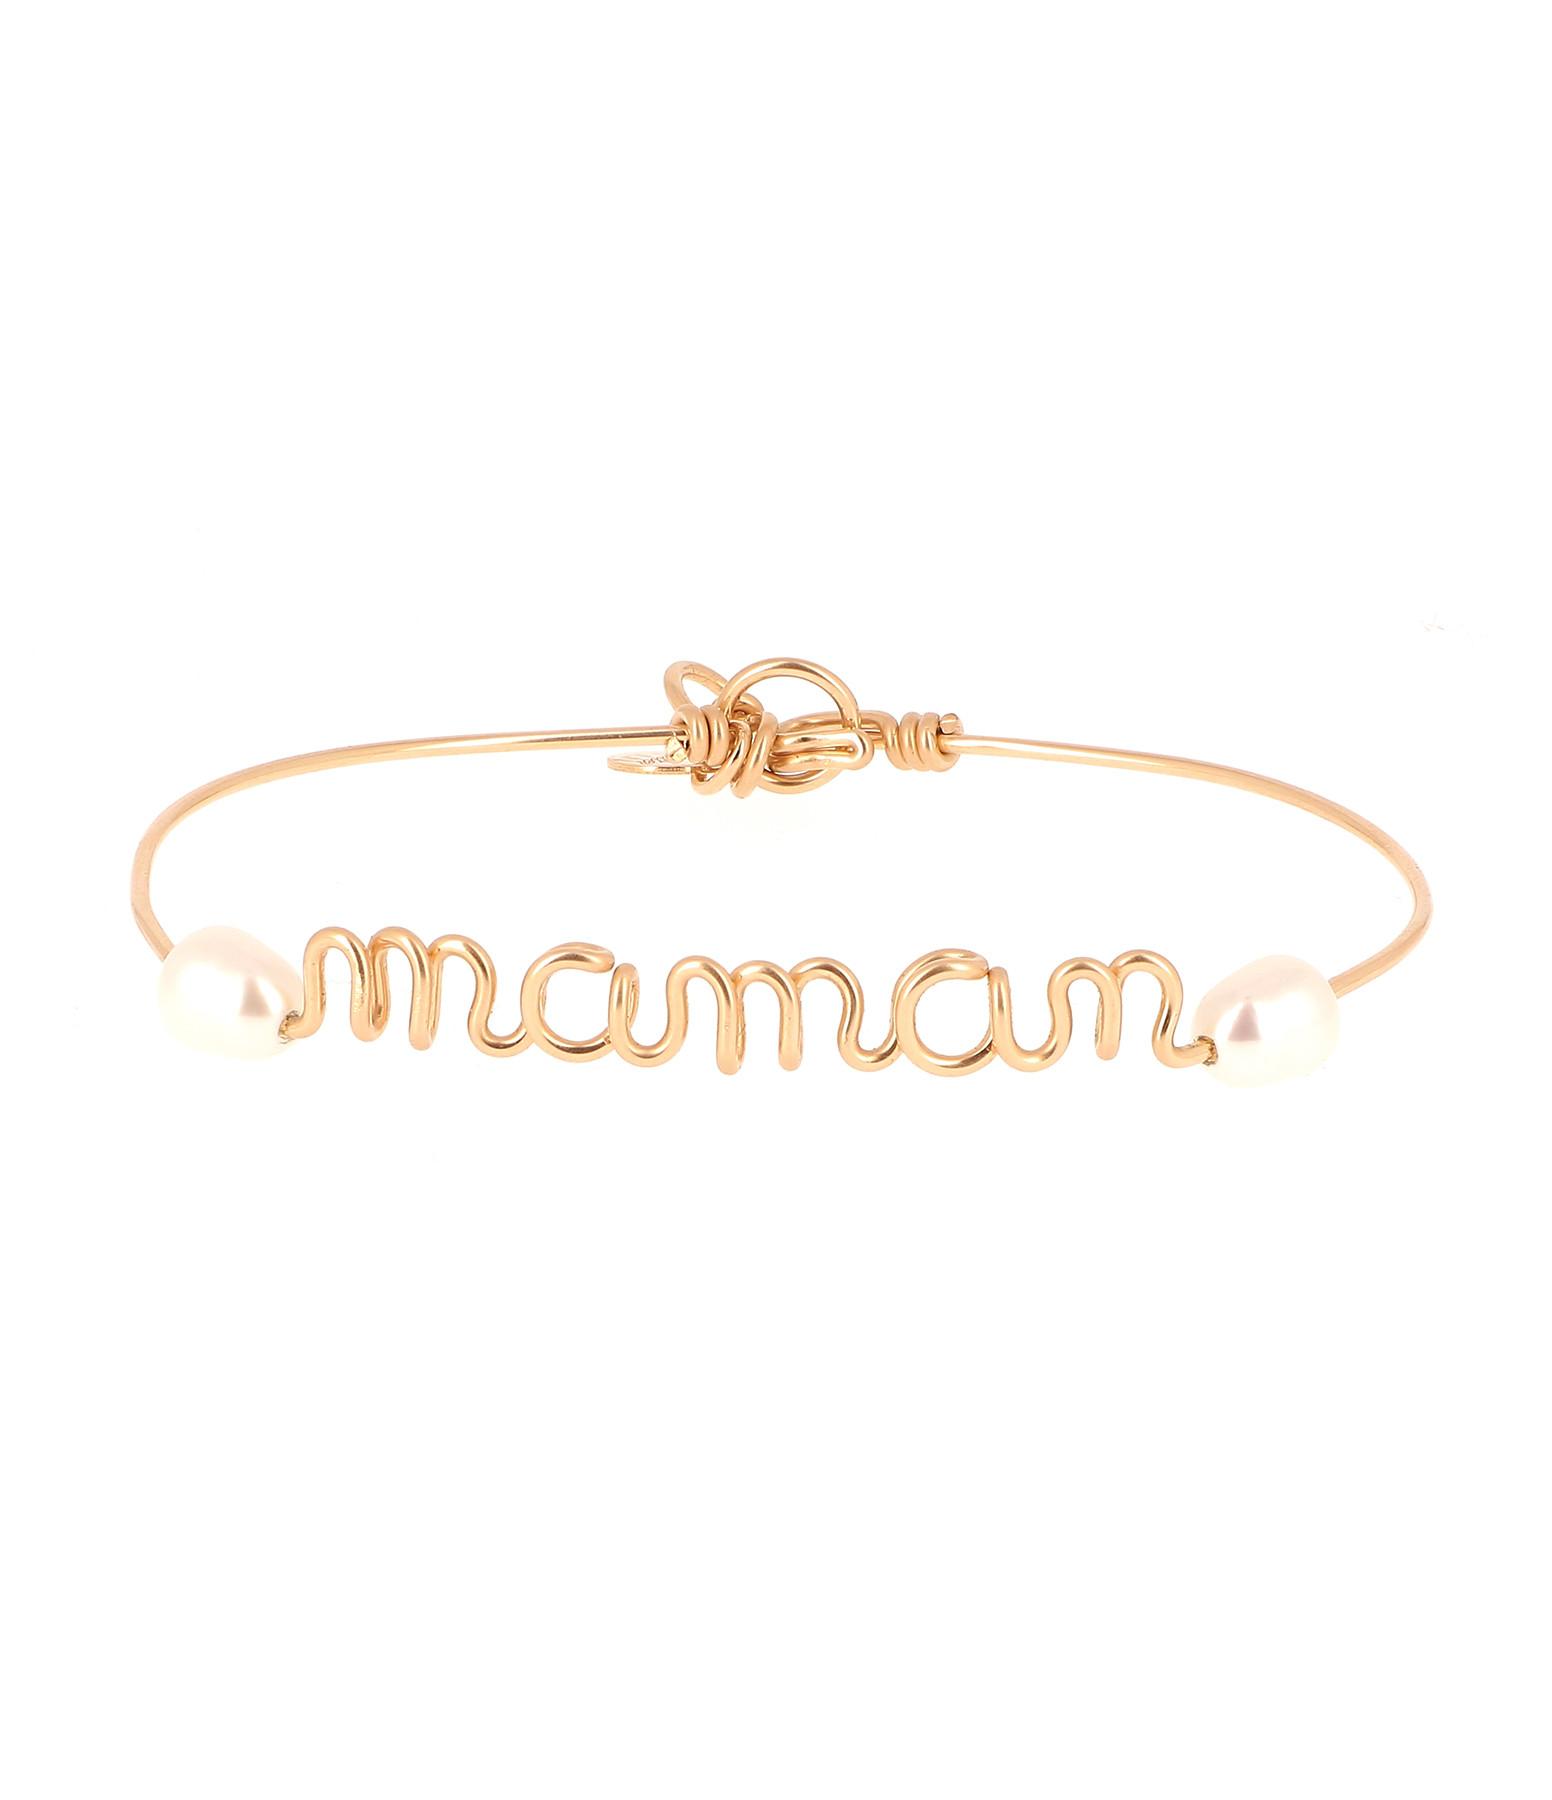 ATELIER PAULIN - Bracelet Fil Maman Perles Rivière Gold Filled